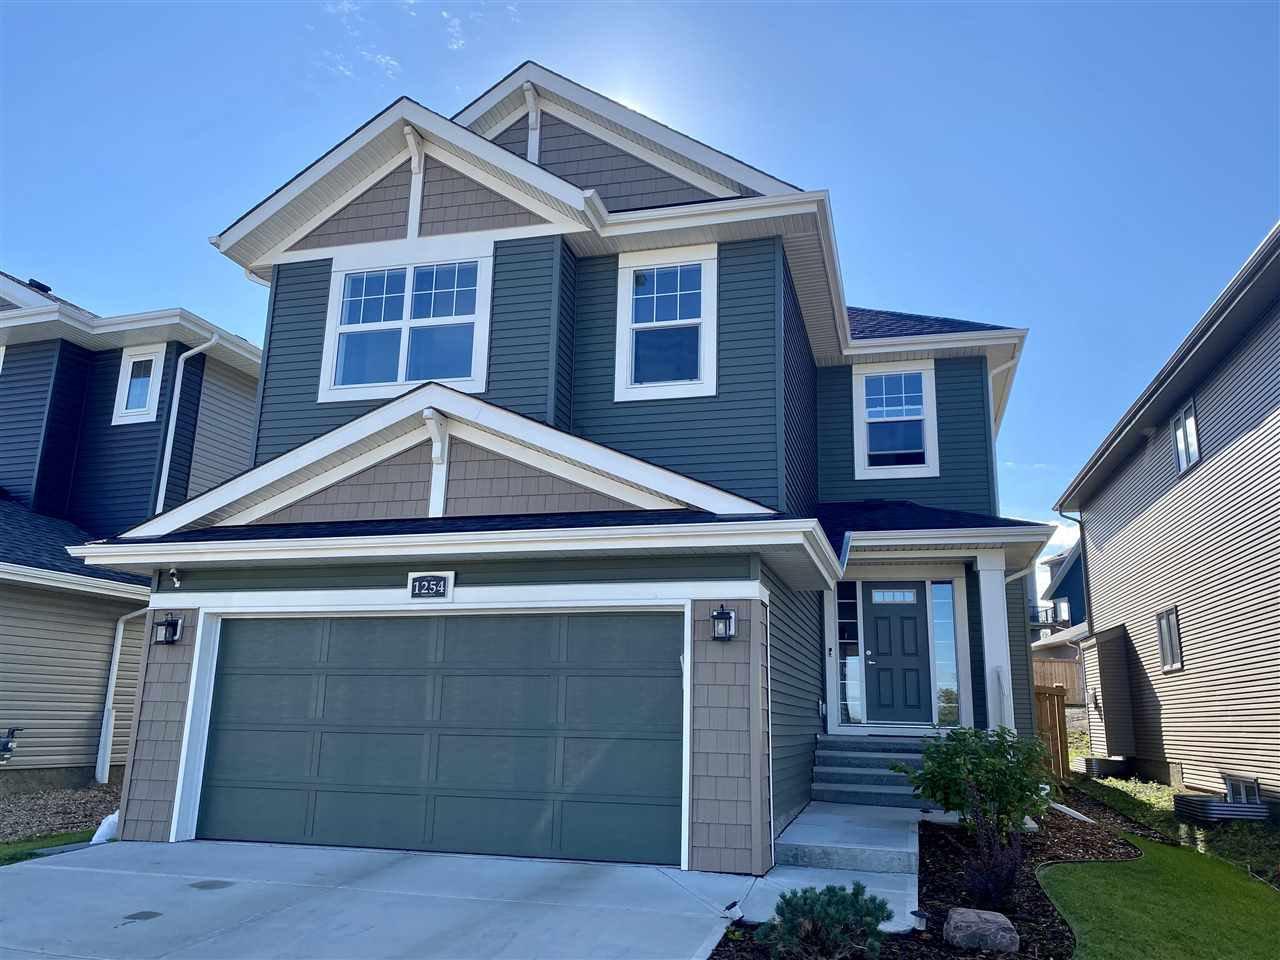 Main Photo: 1254 PEREGRINE Terrace in Edmonton: Zone 59 House for sale : MLS®# E4211748